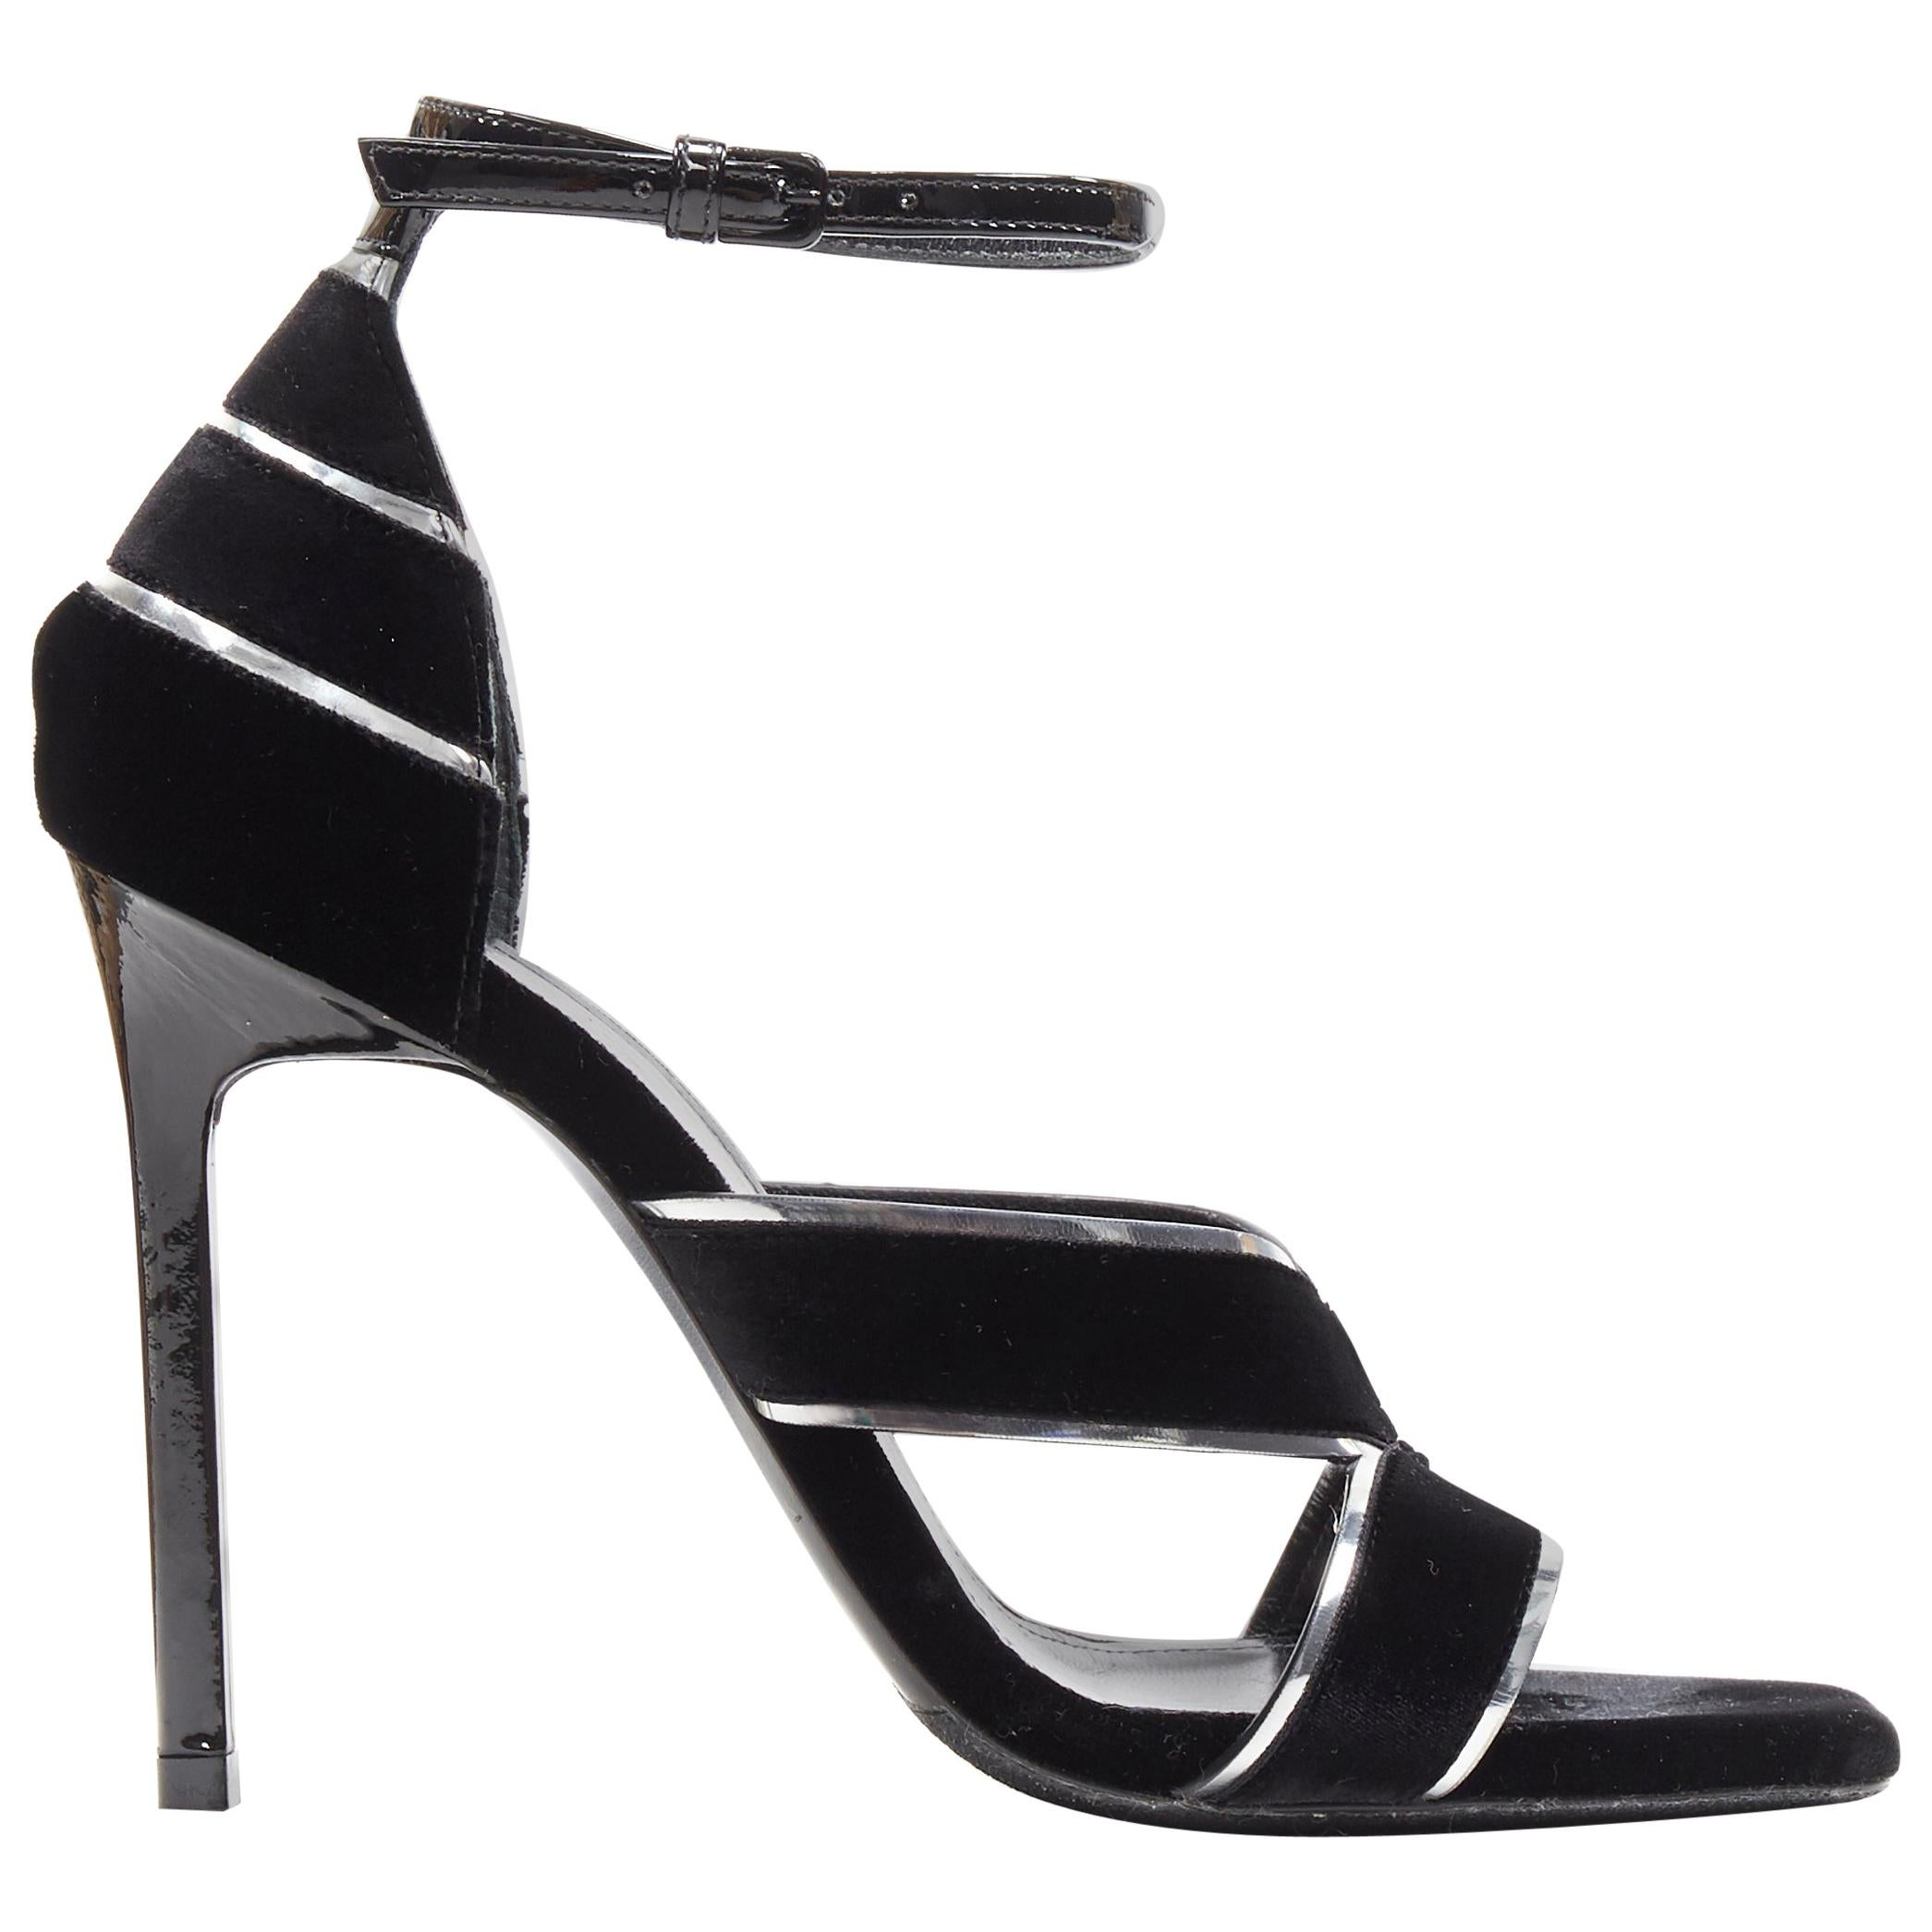 SAINT LAURENT black velvet silver trimmed high heel strappy sandals EU36